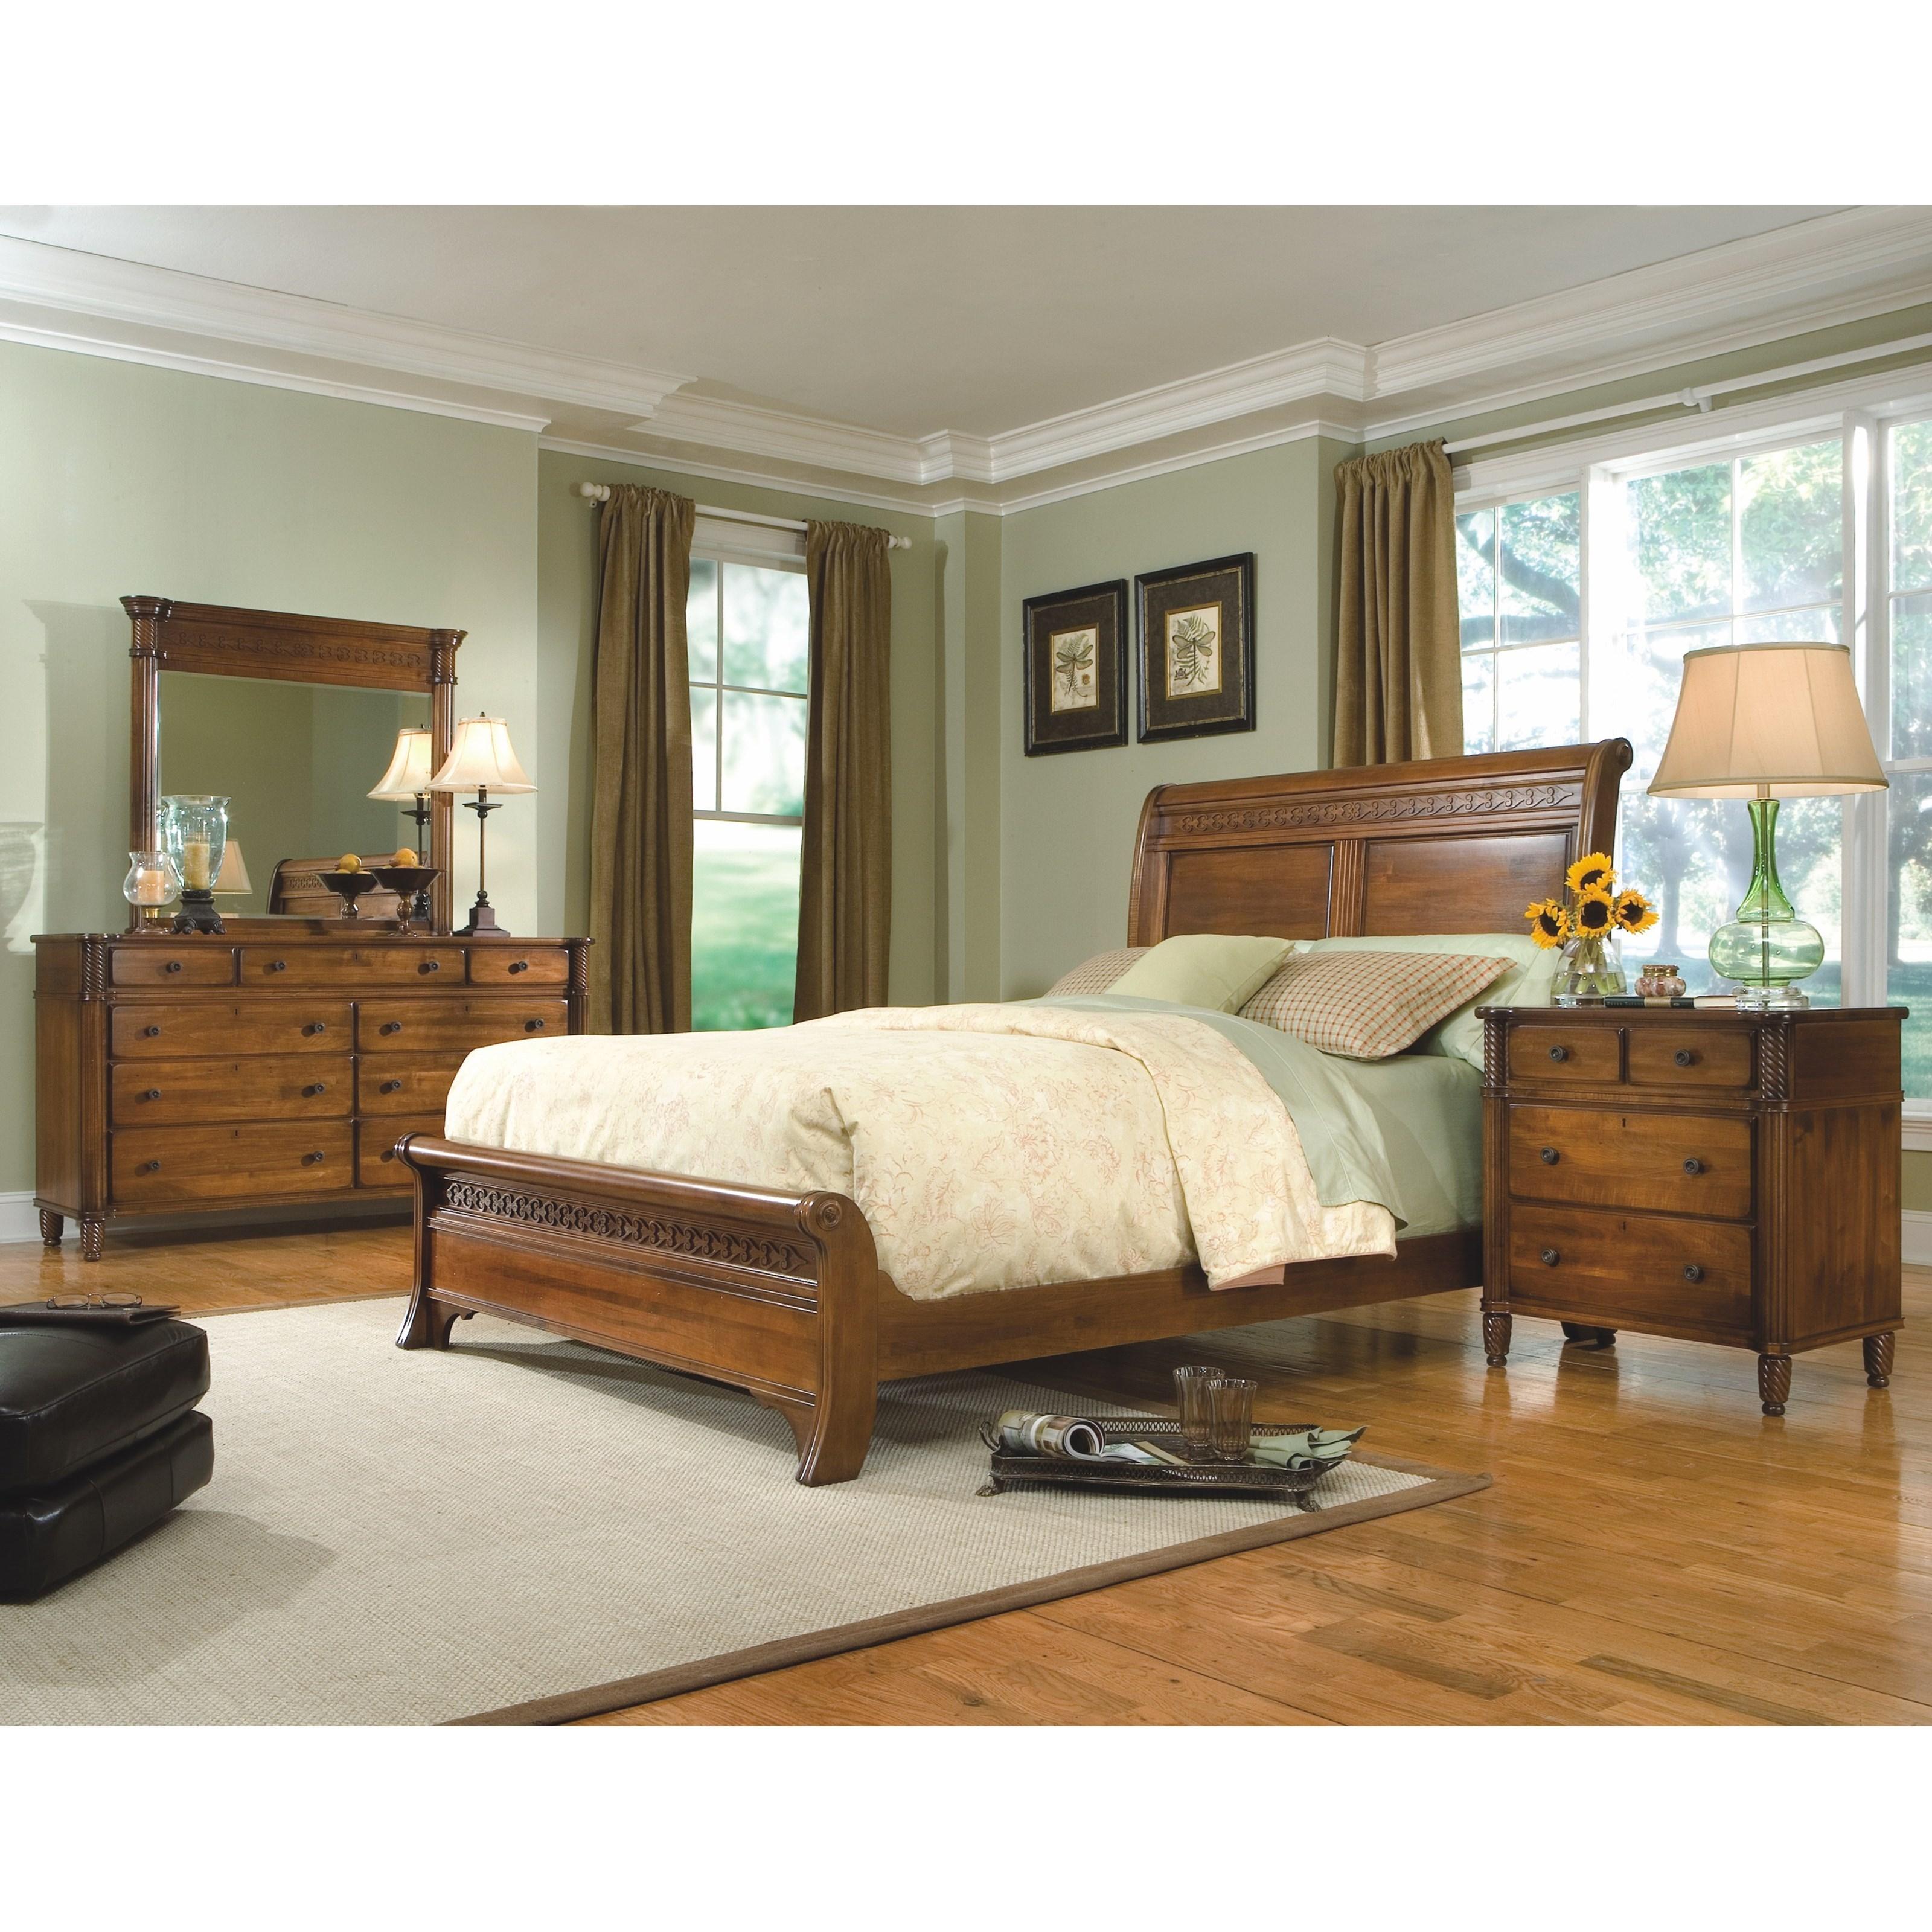 Durham George Washington Architect King Bedroom Group Reid S Furniture Bedroom Groups